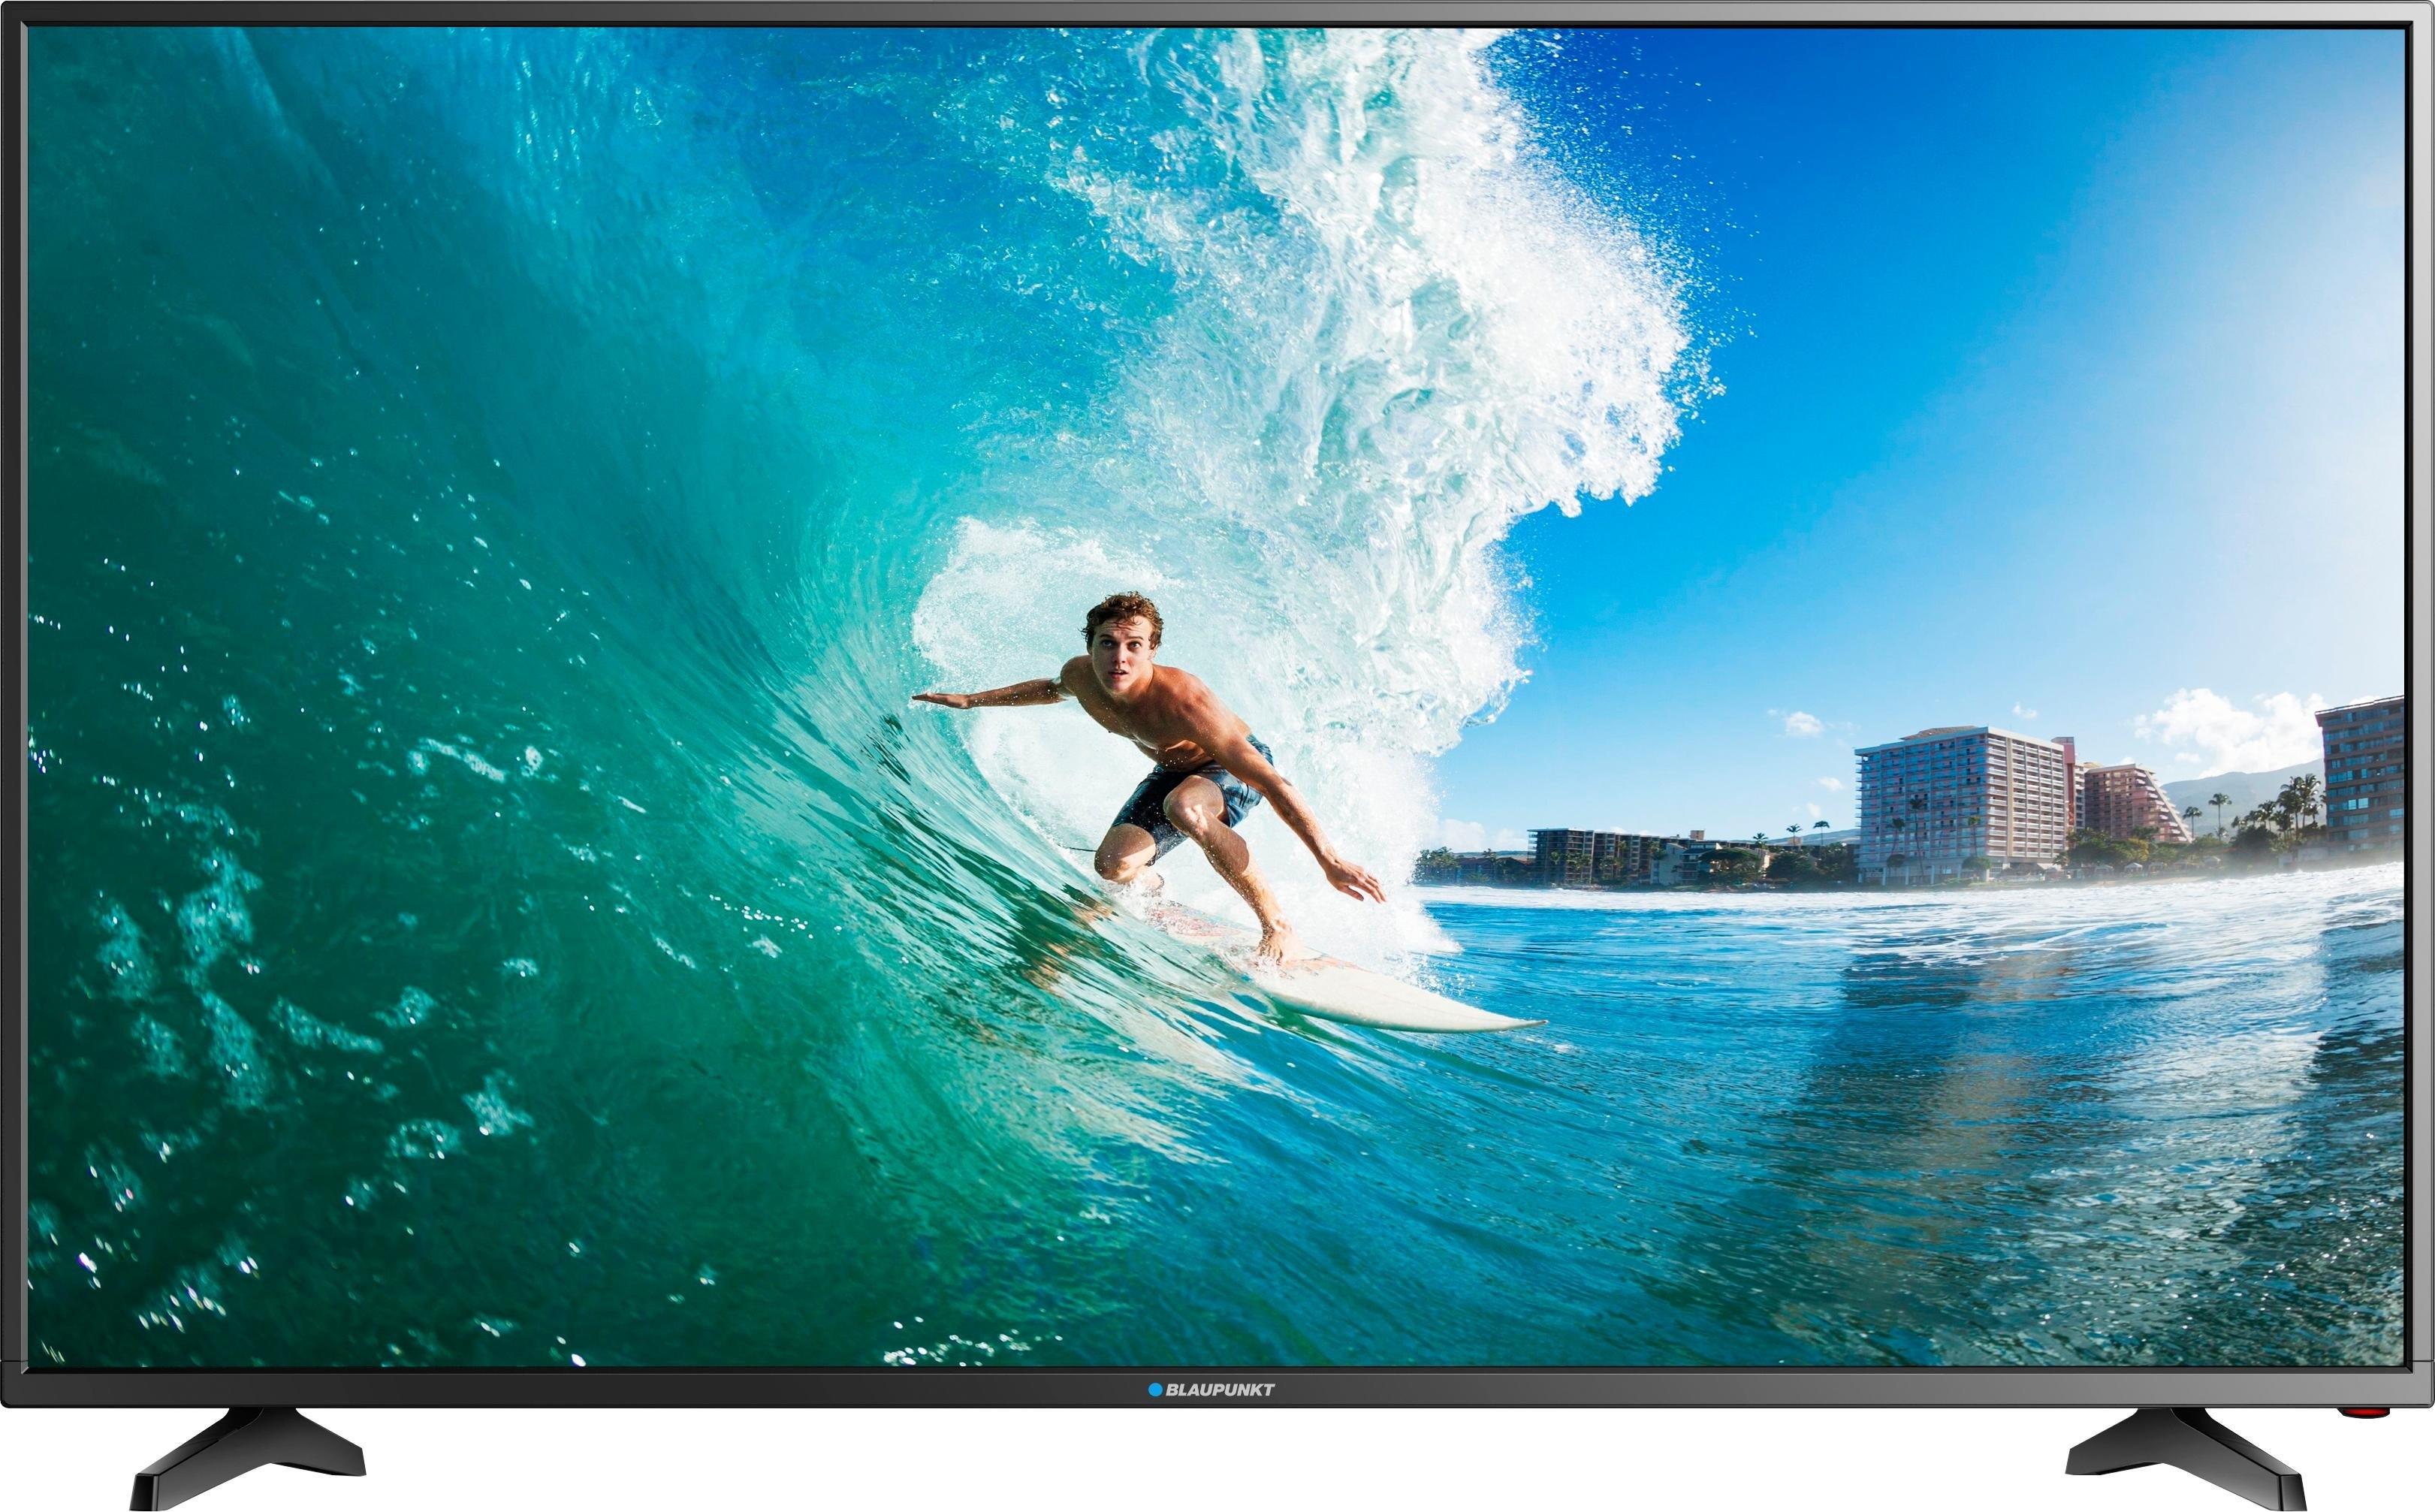 Blaupunkt BLA-50/405V-GB-11B4-UEGBQPX-EU led-tv (127 cm / (50 inch), 4K Ultra HD, smart-tv goedkoop op otto.nl kopen